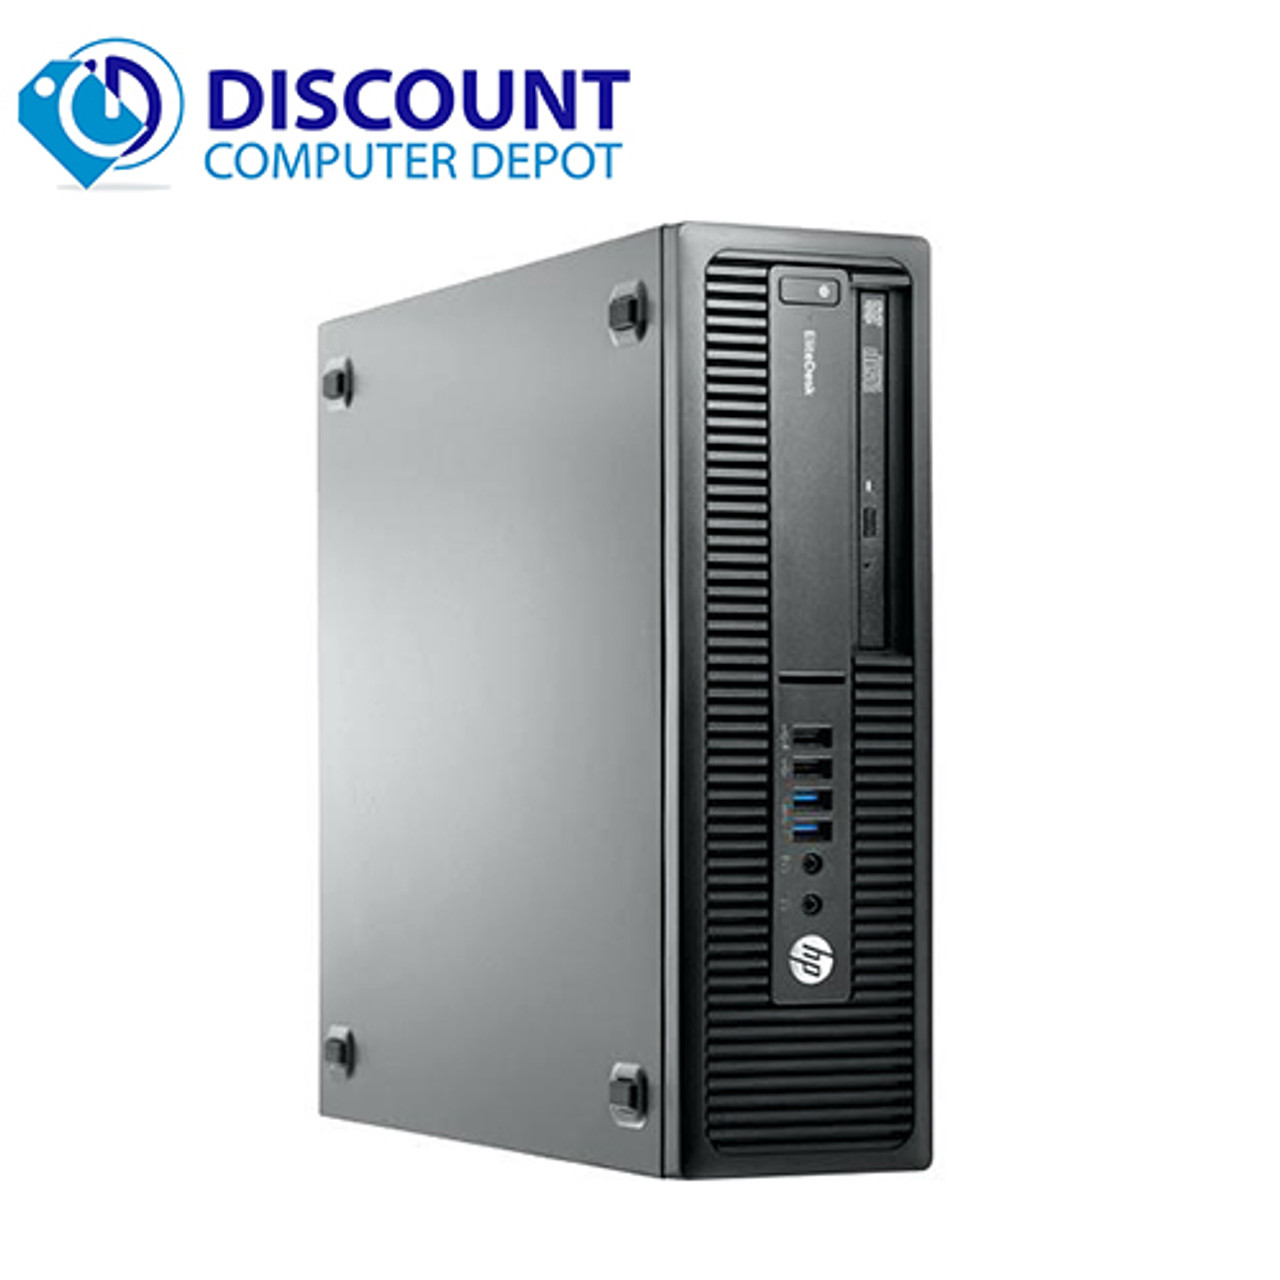 HP EliteDesk 800 G1 Desktop Computer Core i7-4770 8GB 256GB SSD Windows 10  Pro